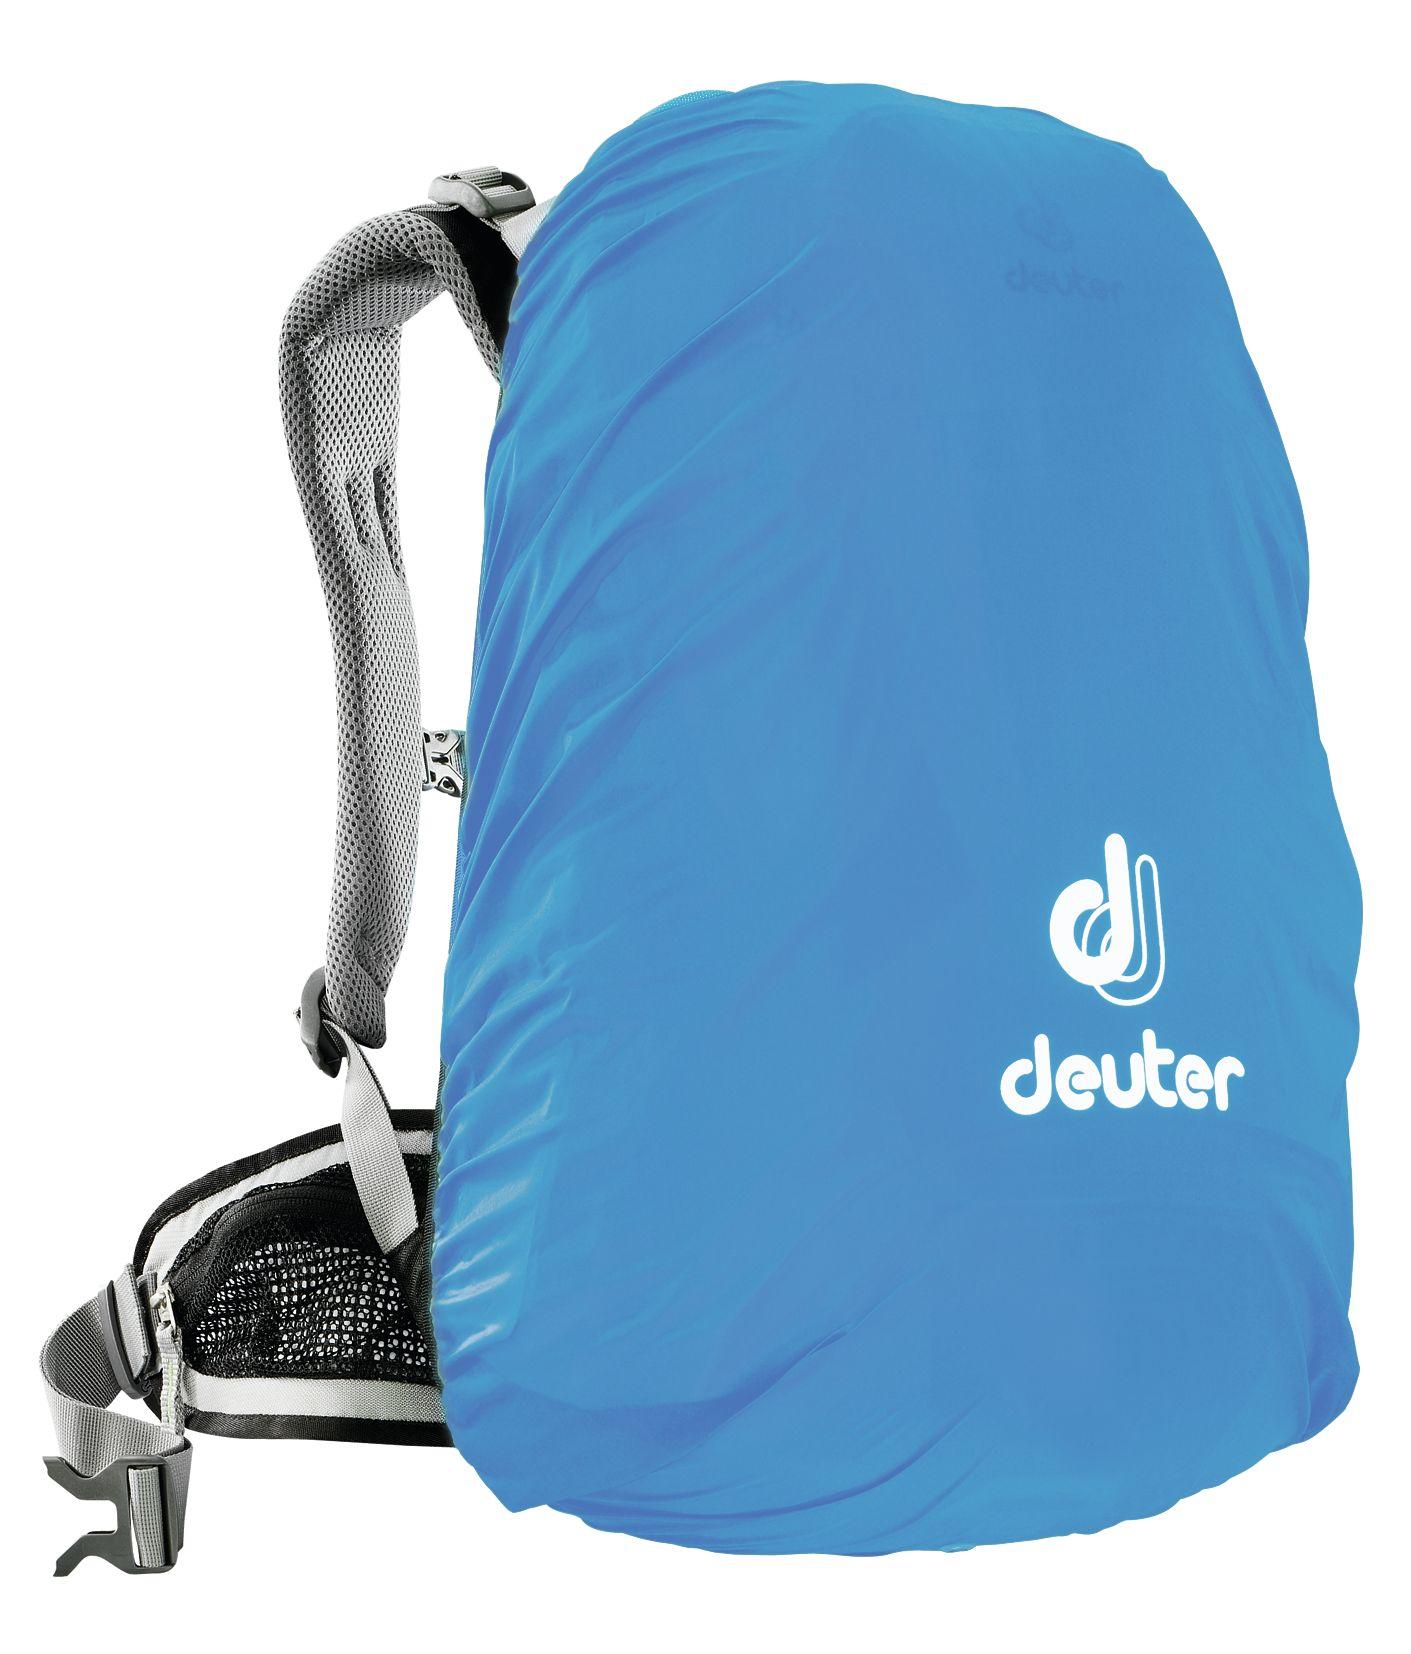 Deuter - Rain Cover 1 (20-35L) - Funda impermeable